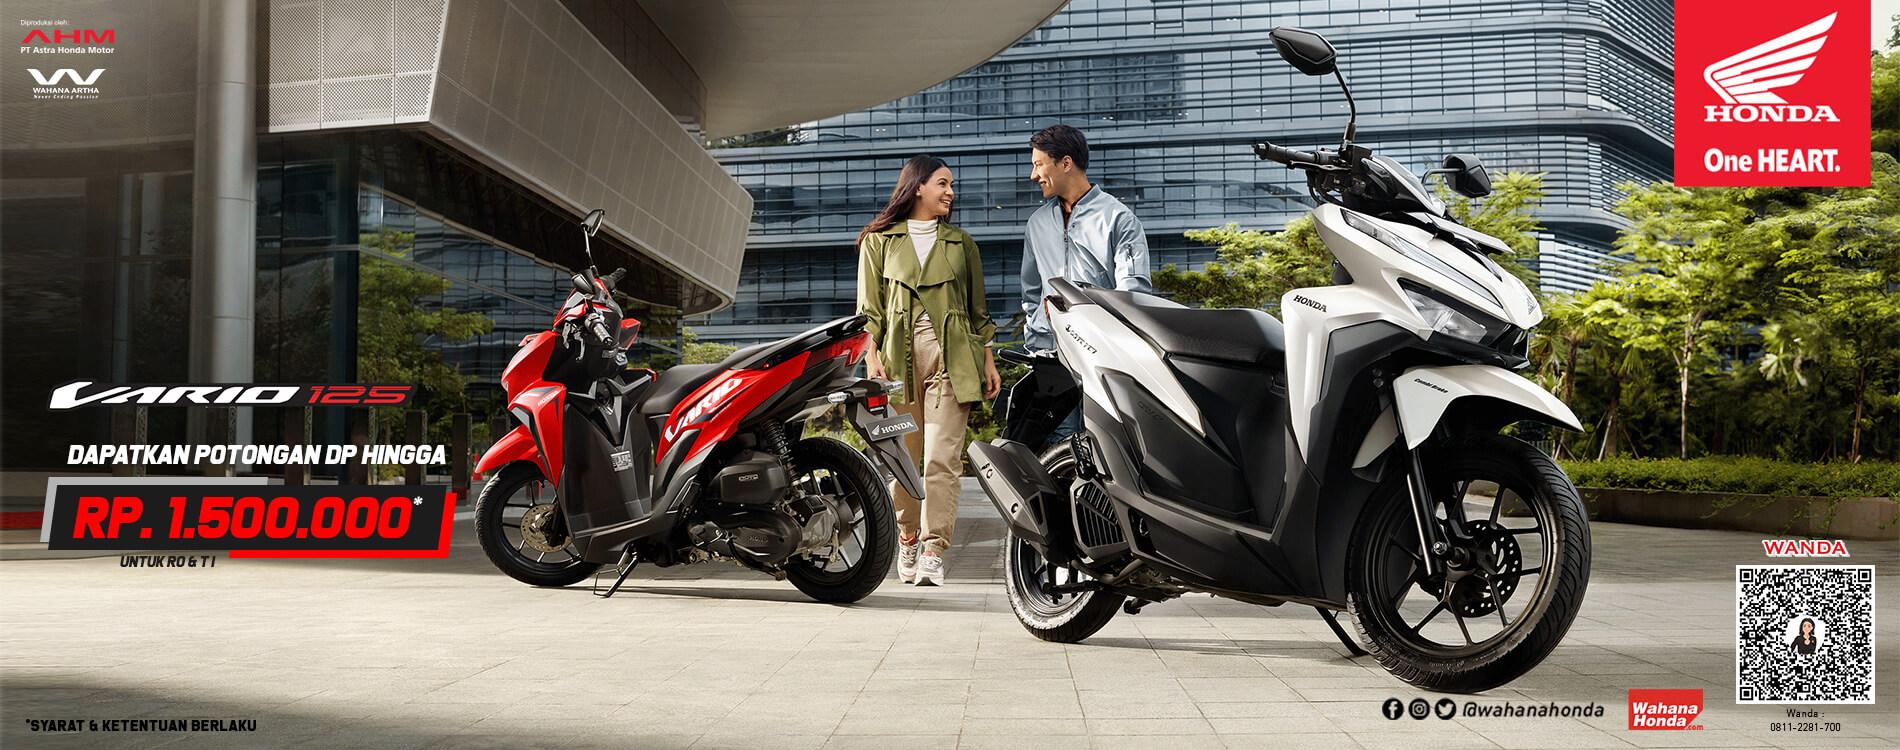 Promo Honda Vario 125 -  Periode Mei 2021